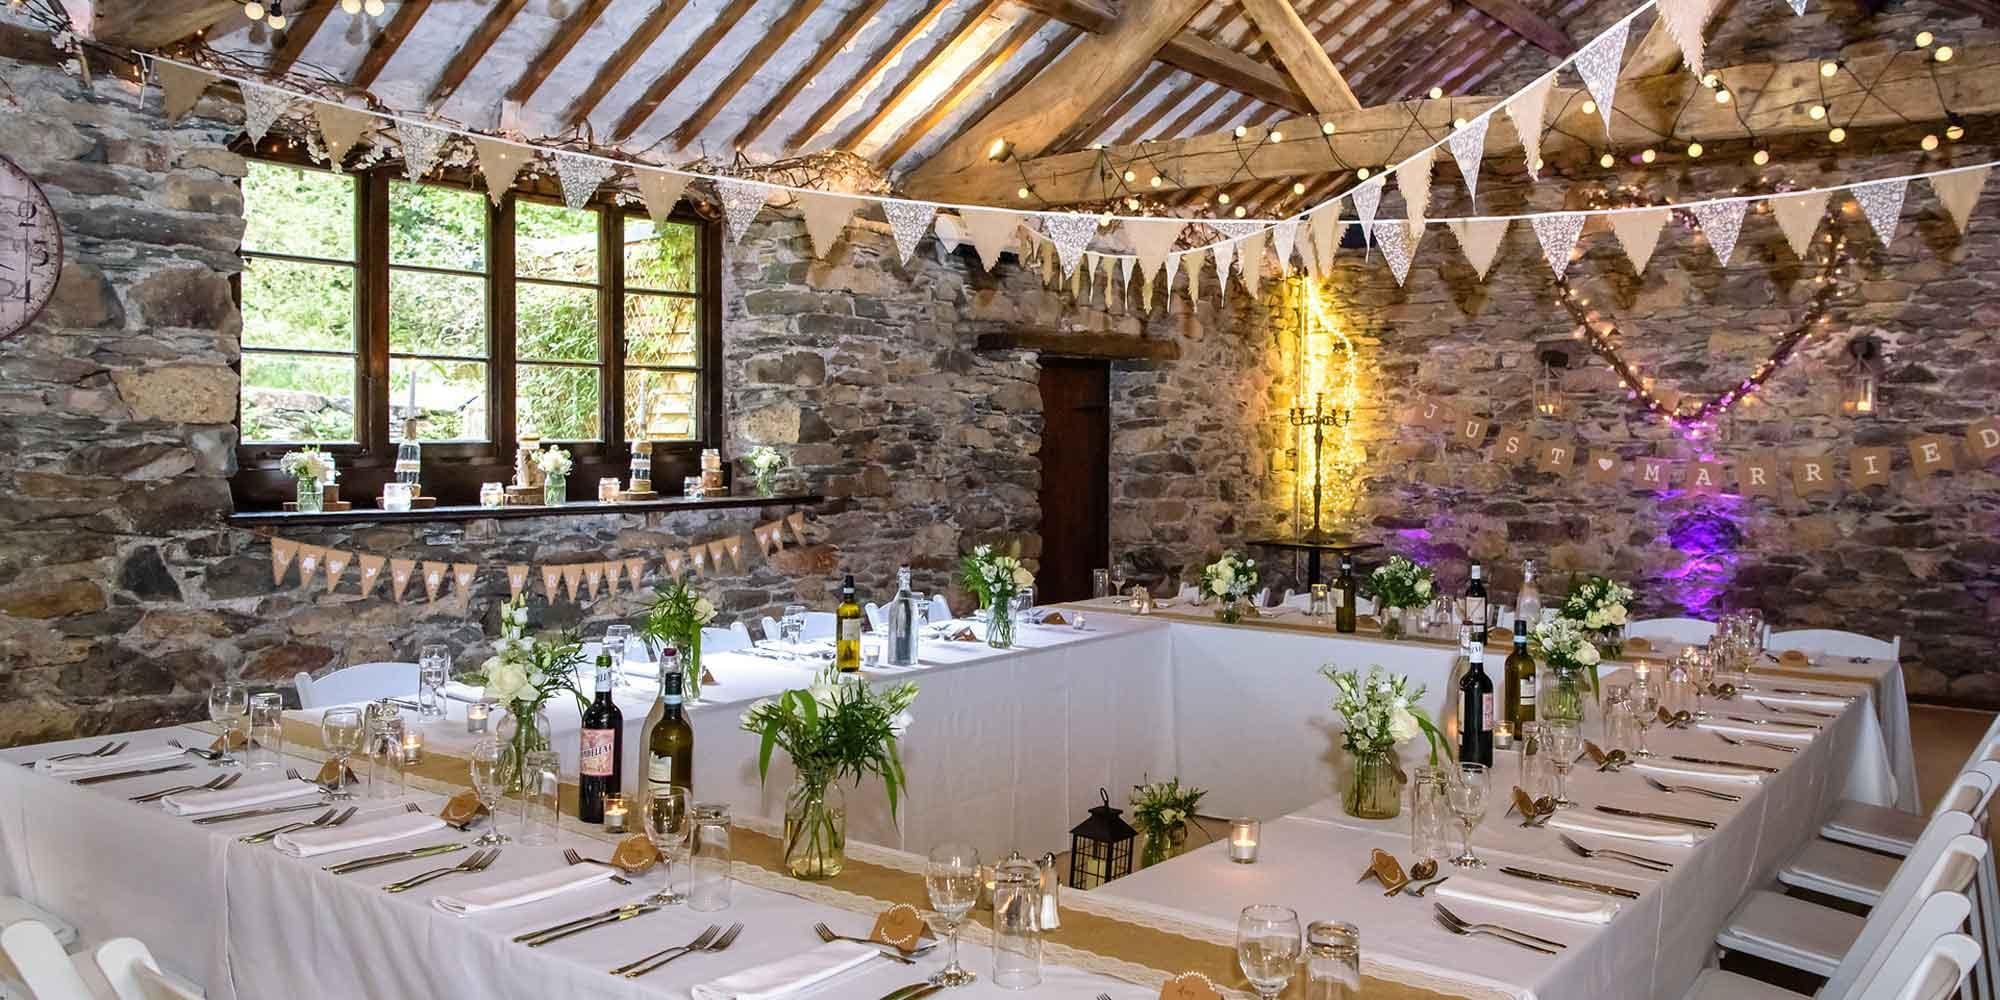 Small and Intimate Barn Wedding Venue